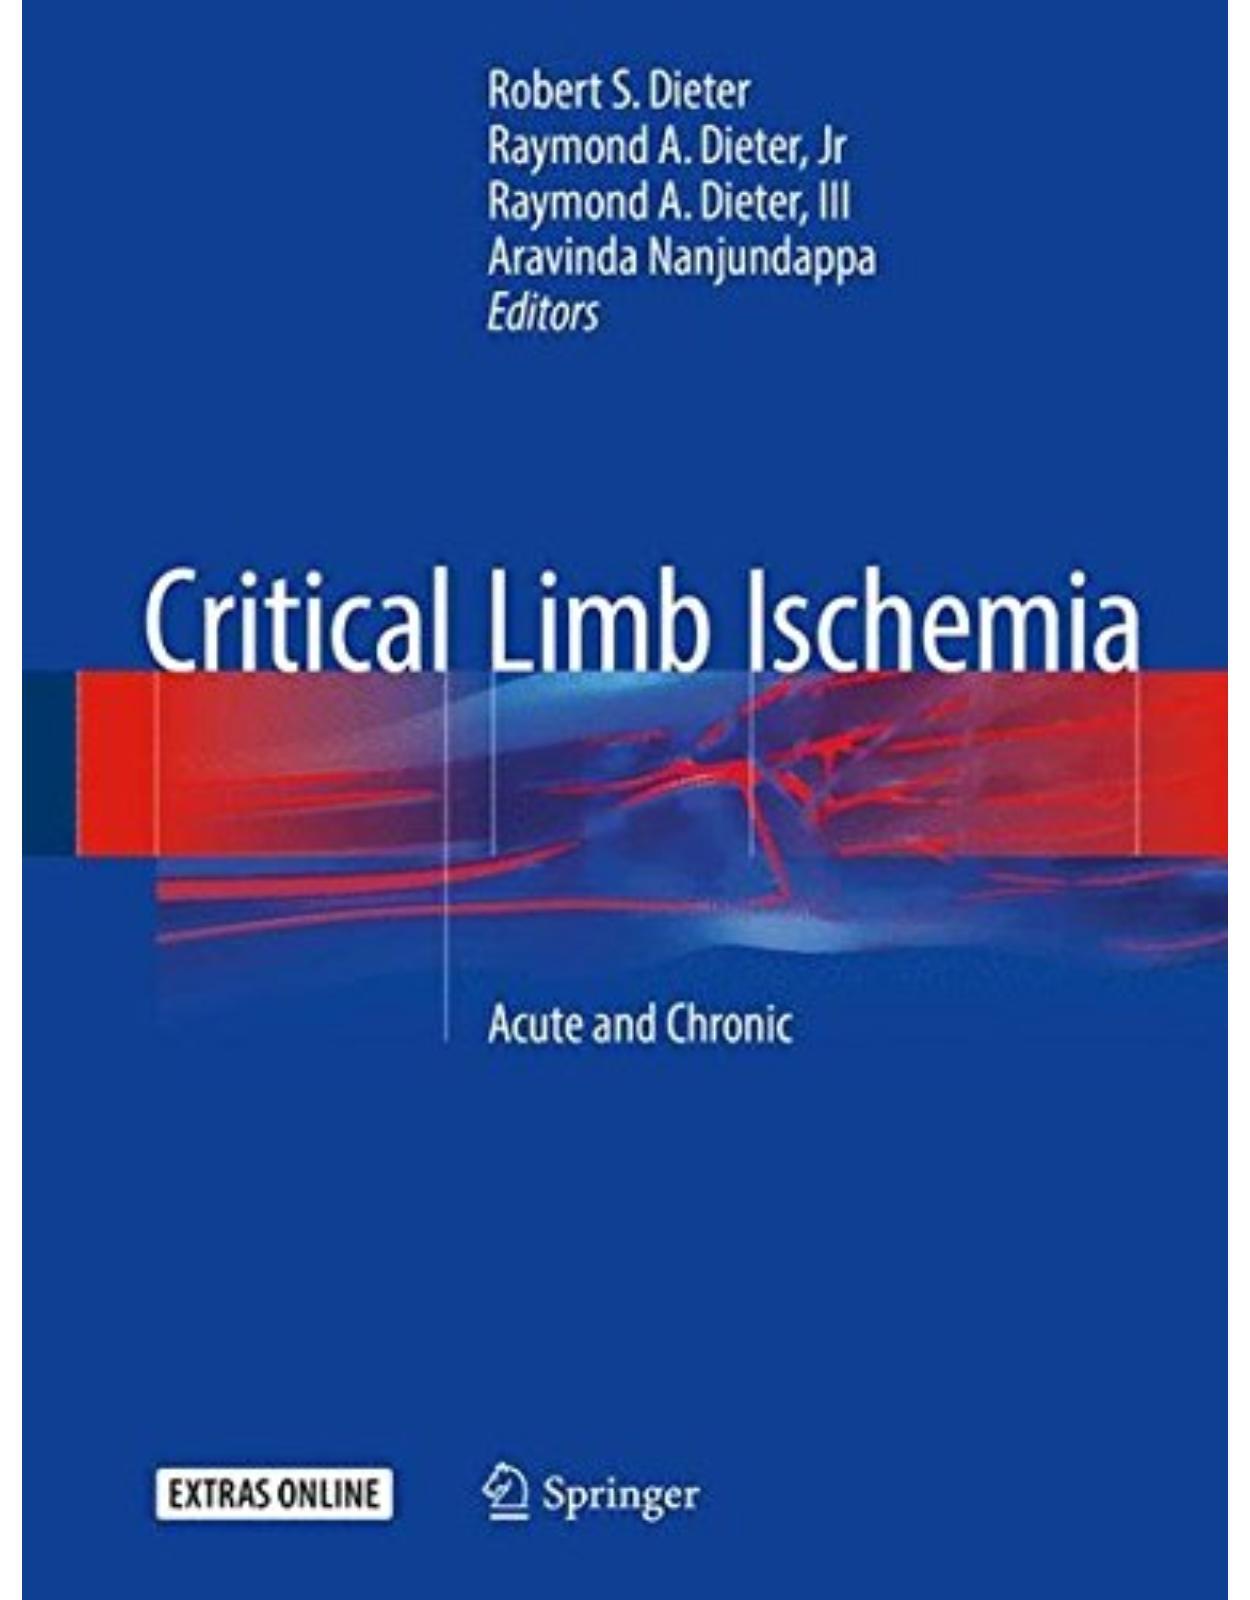 Critical Limb Ischemia: Acute and Chronic